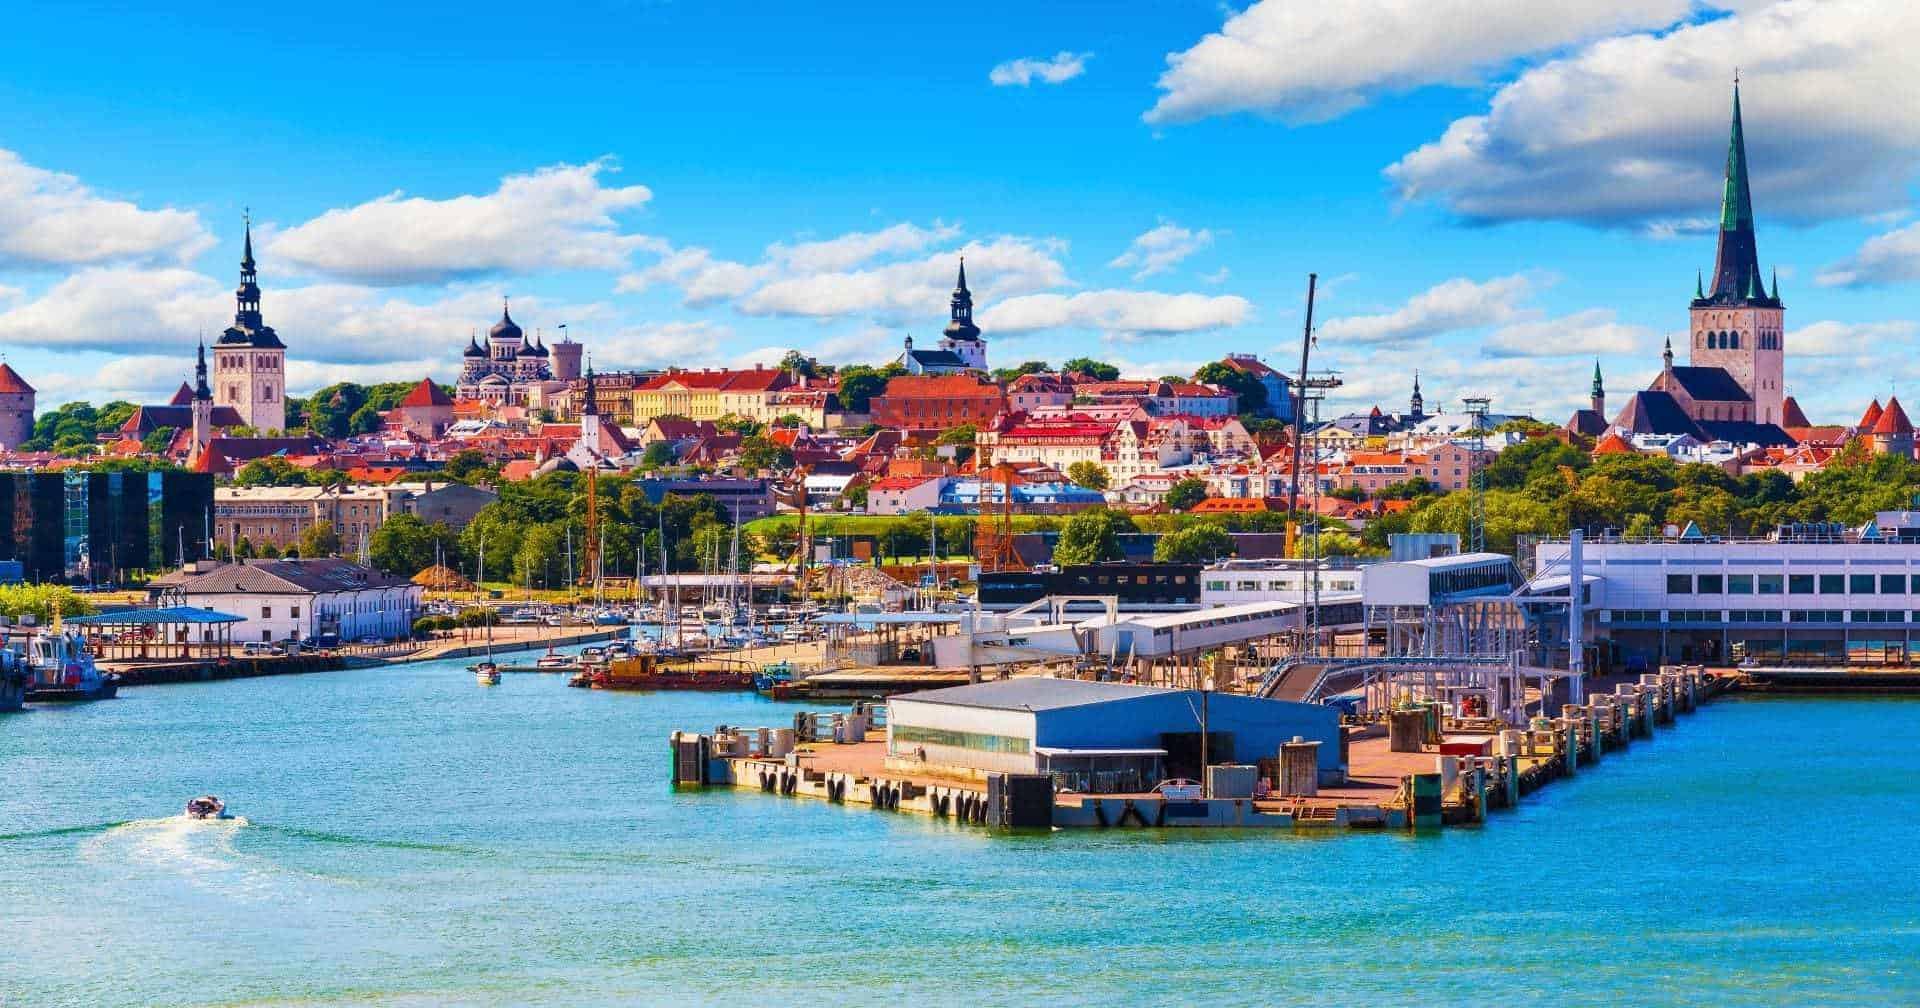 Old Town and sea port harbor in Tallinn Estonia